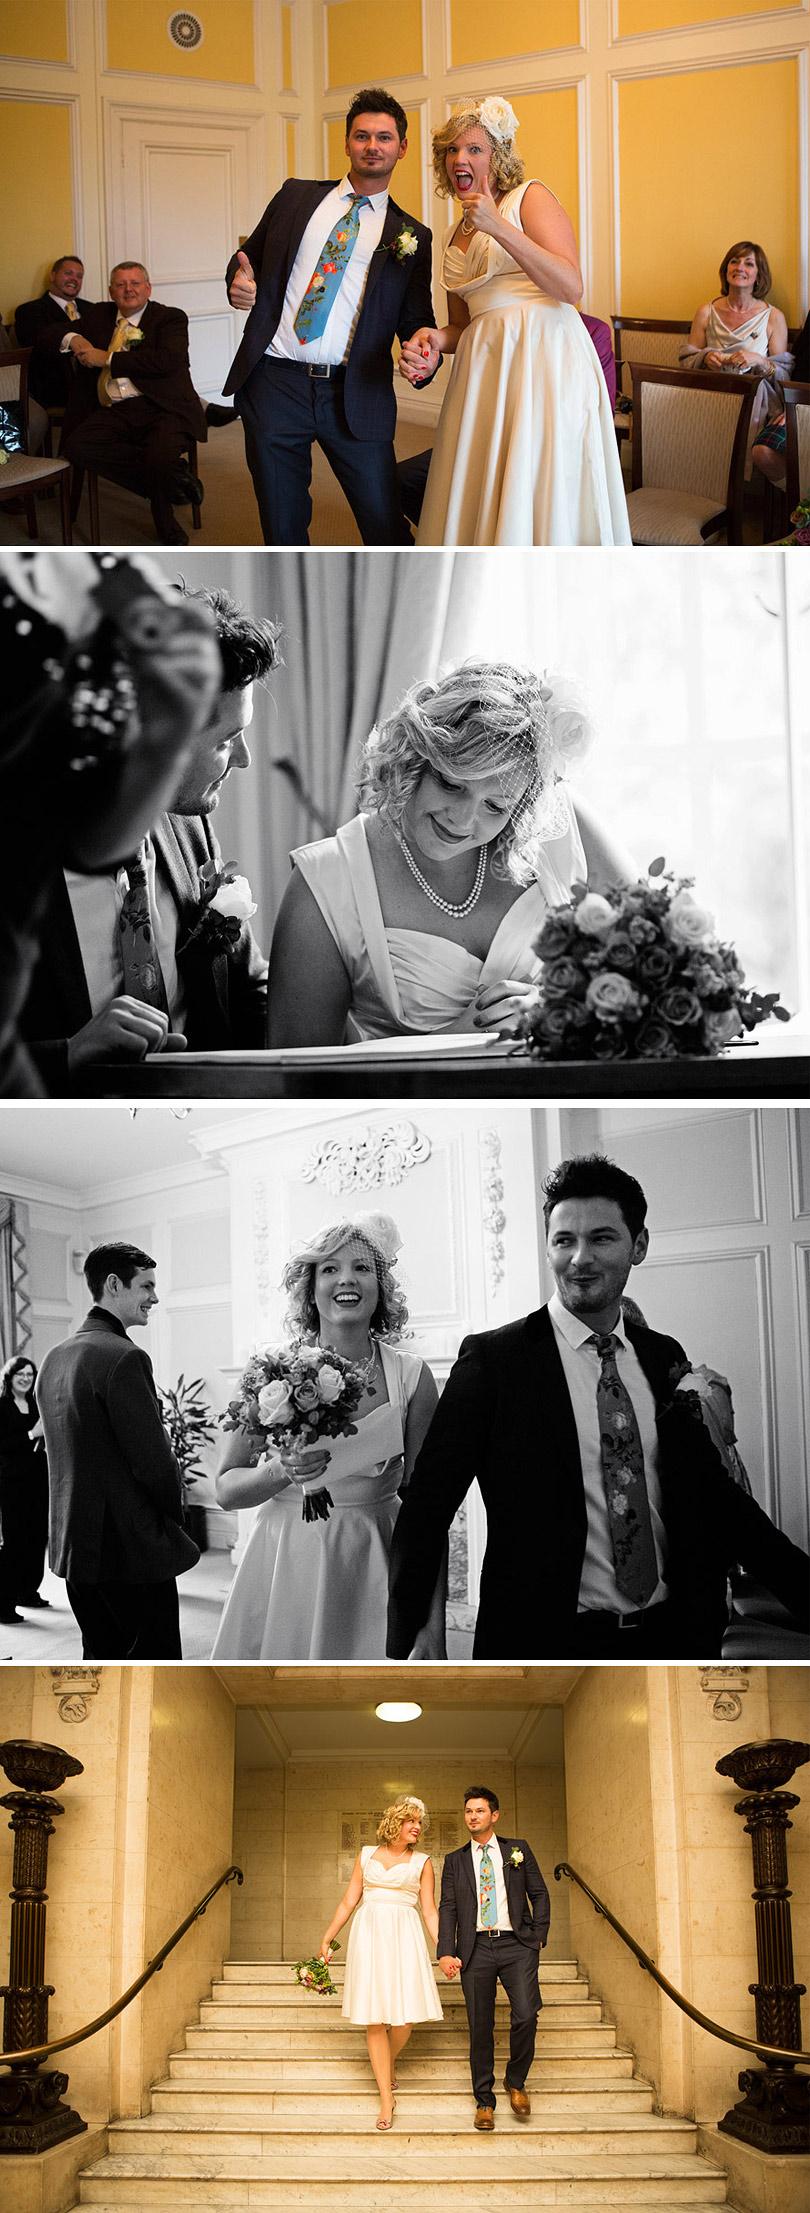 Ben-&-Dee-London-Wedding-8.jpg